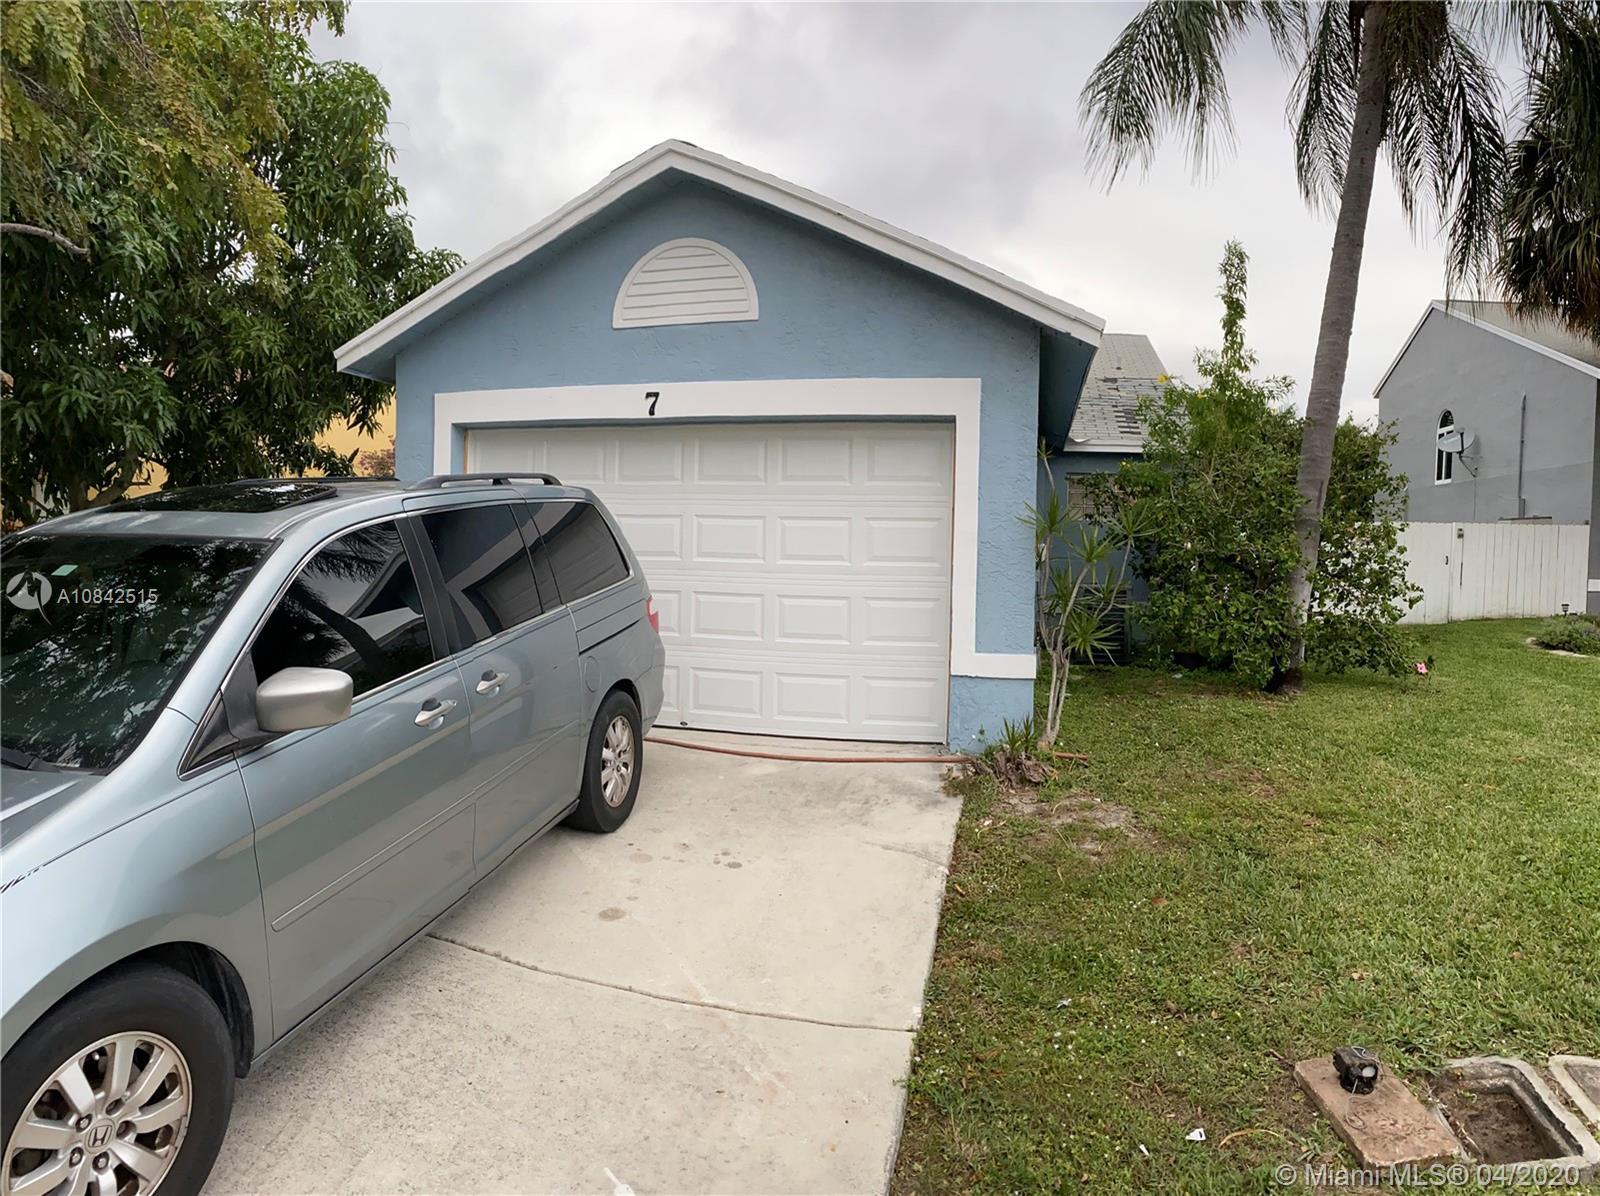 7 Ripley Way 7, Boynton Beach, FL 33426